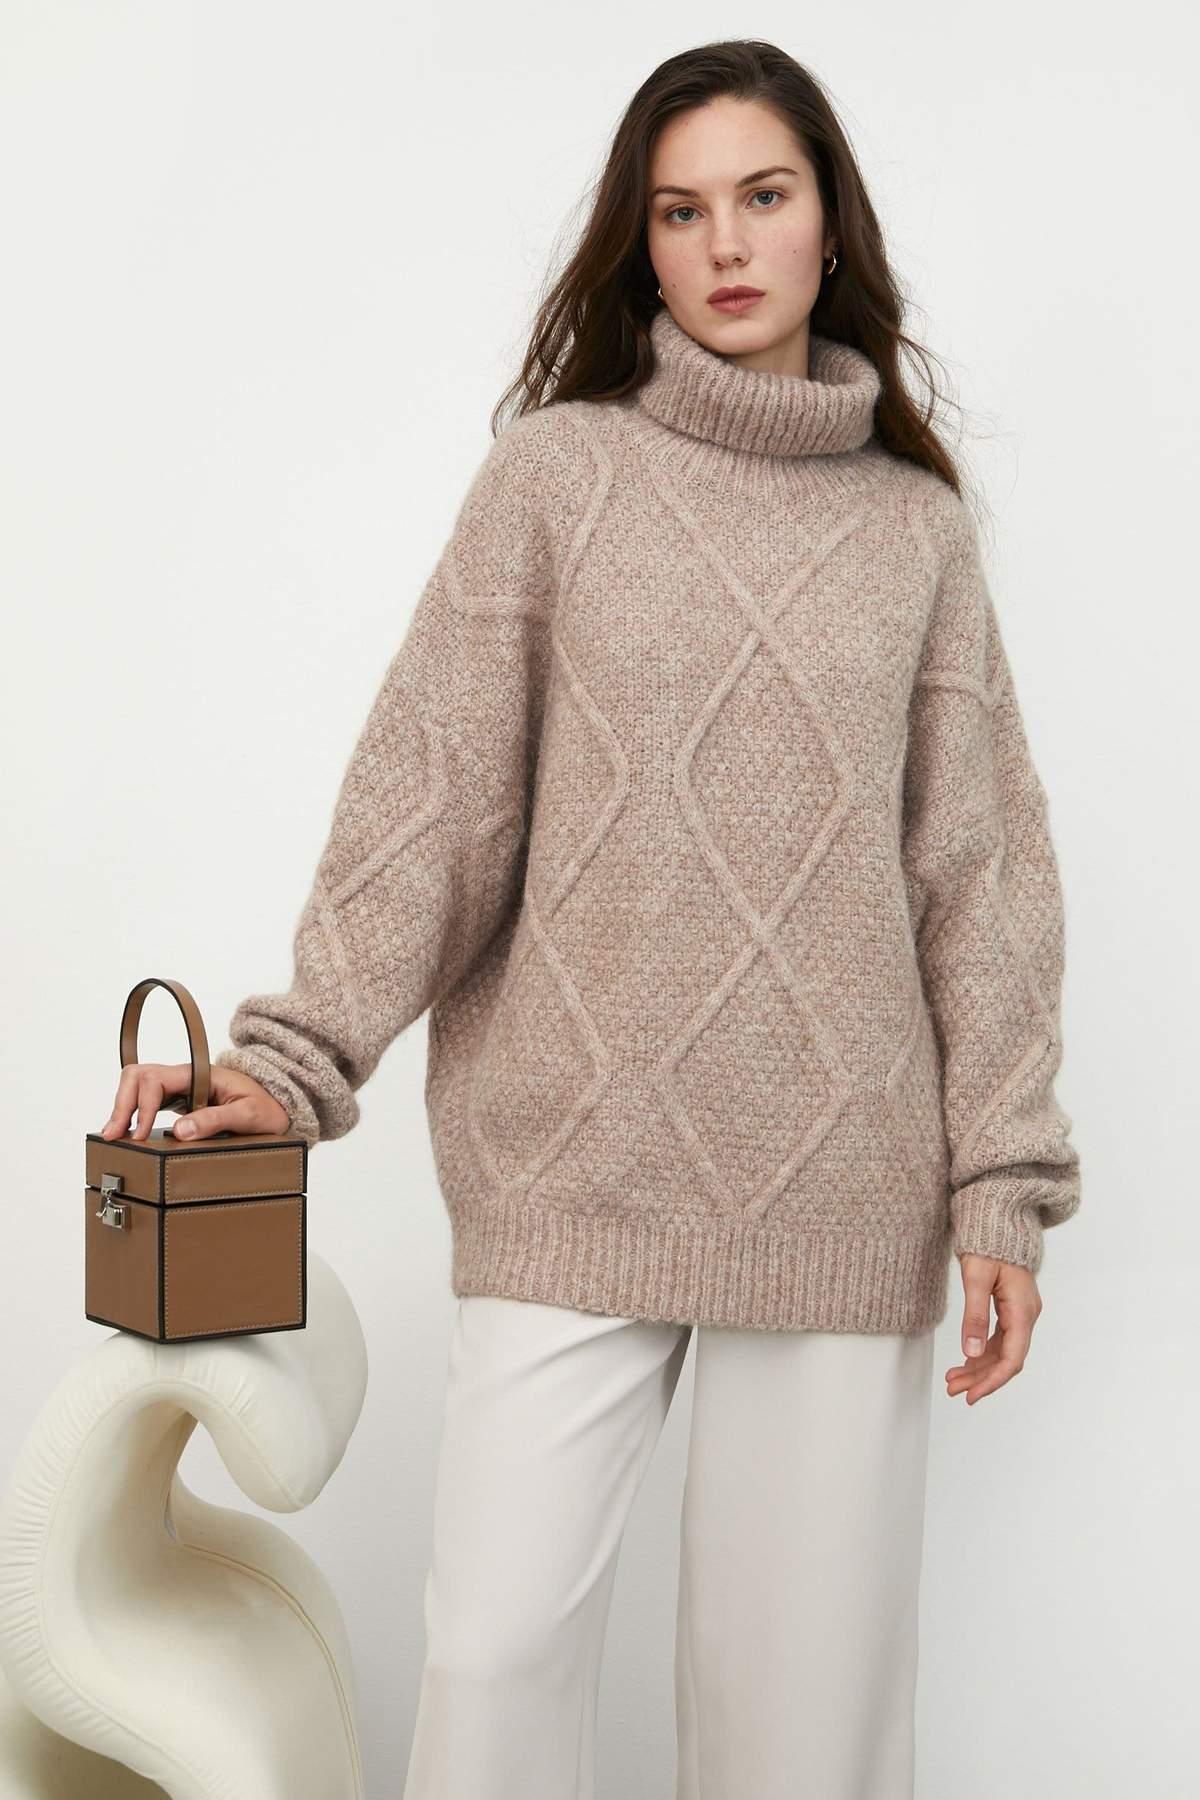 Sabrina Tan Diamond Turtleneck Sweater $37.49